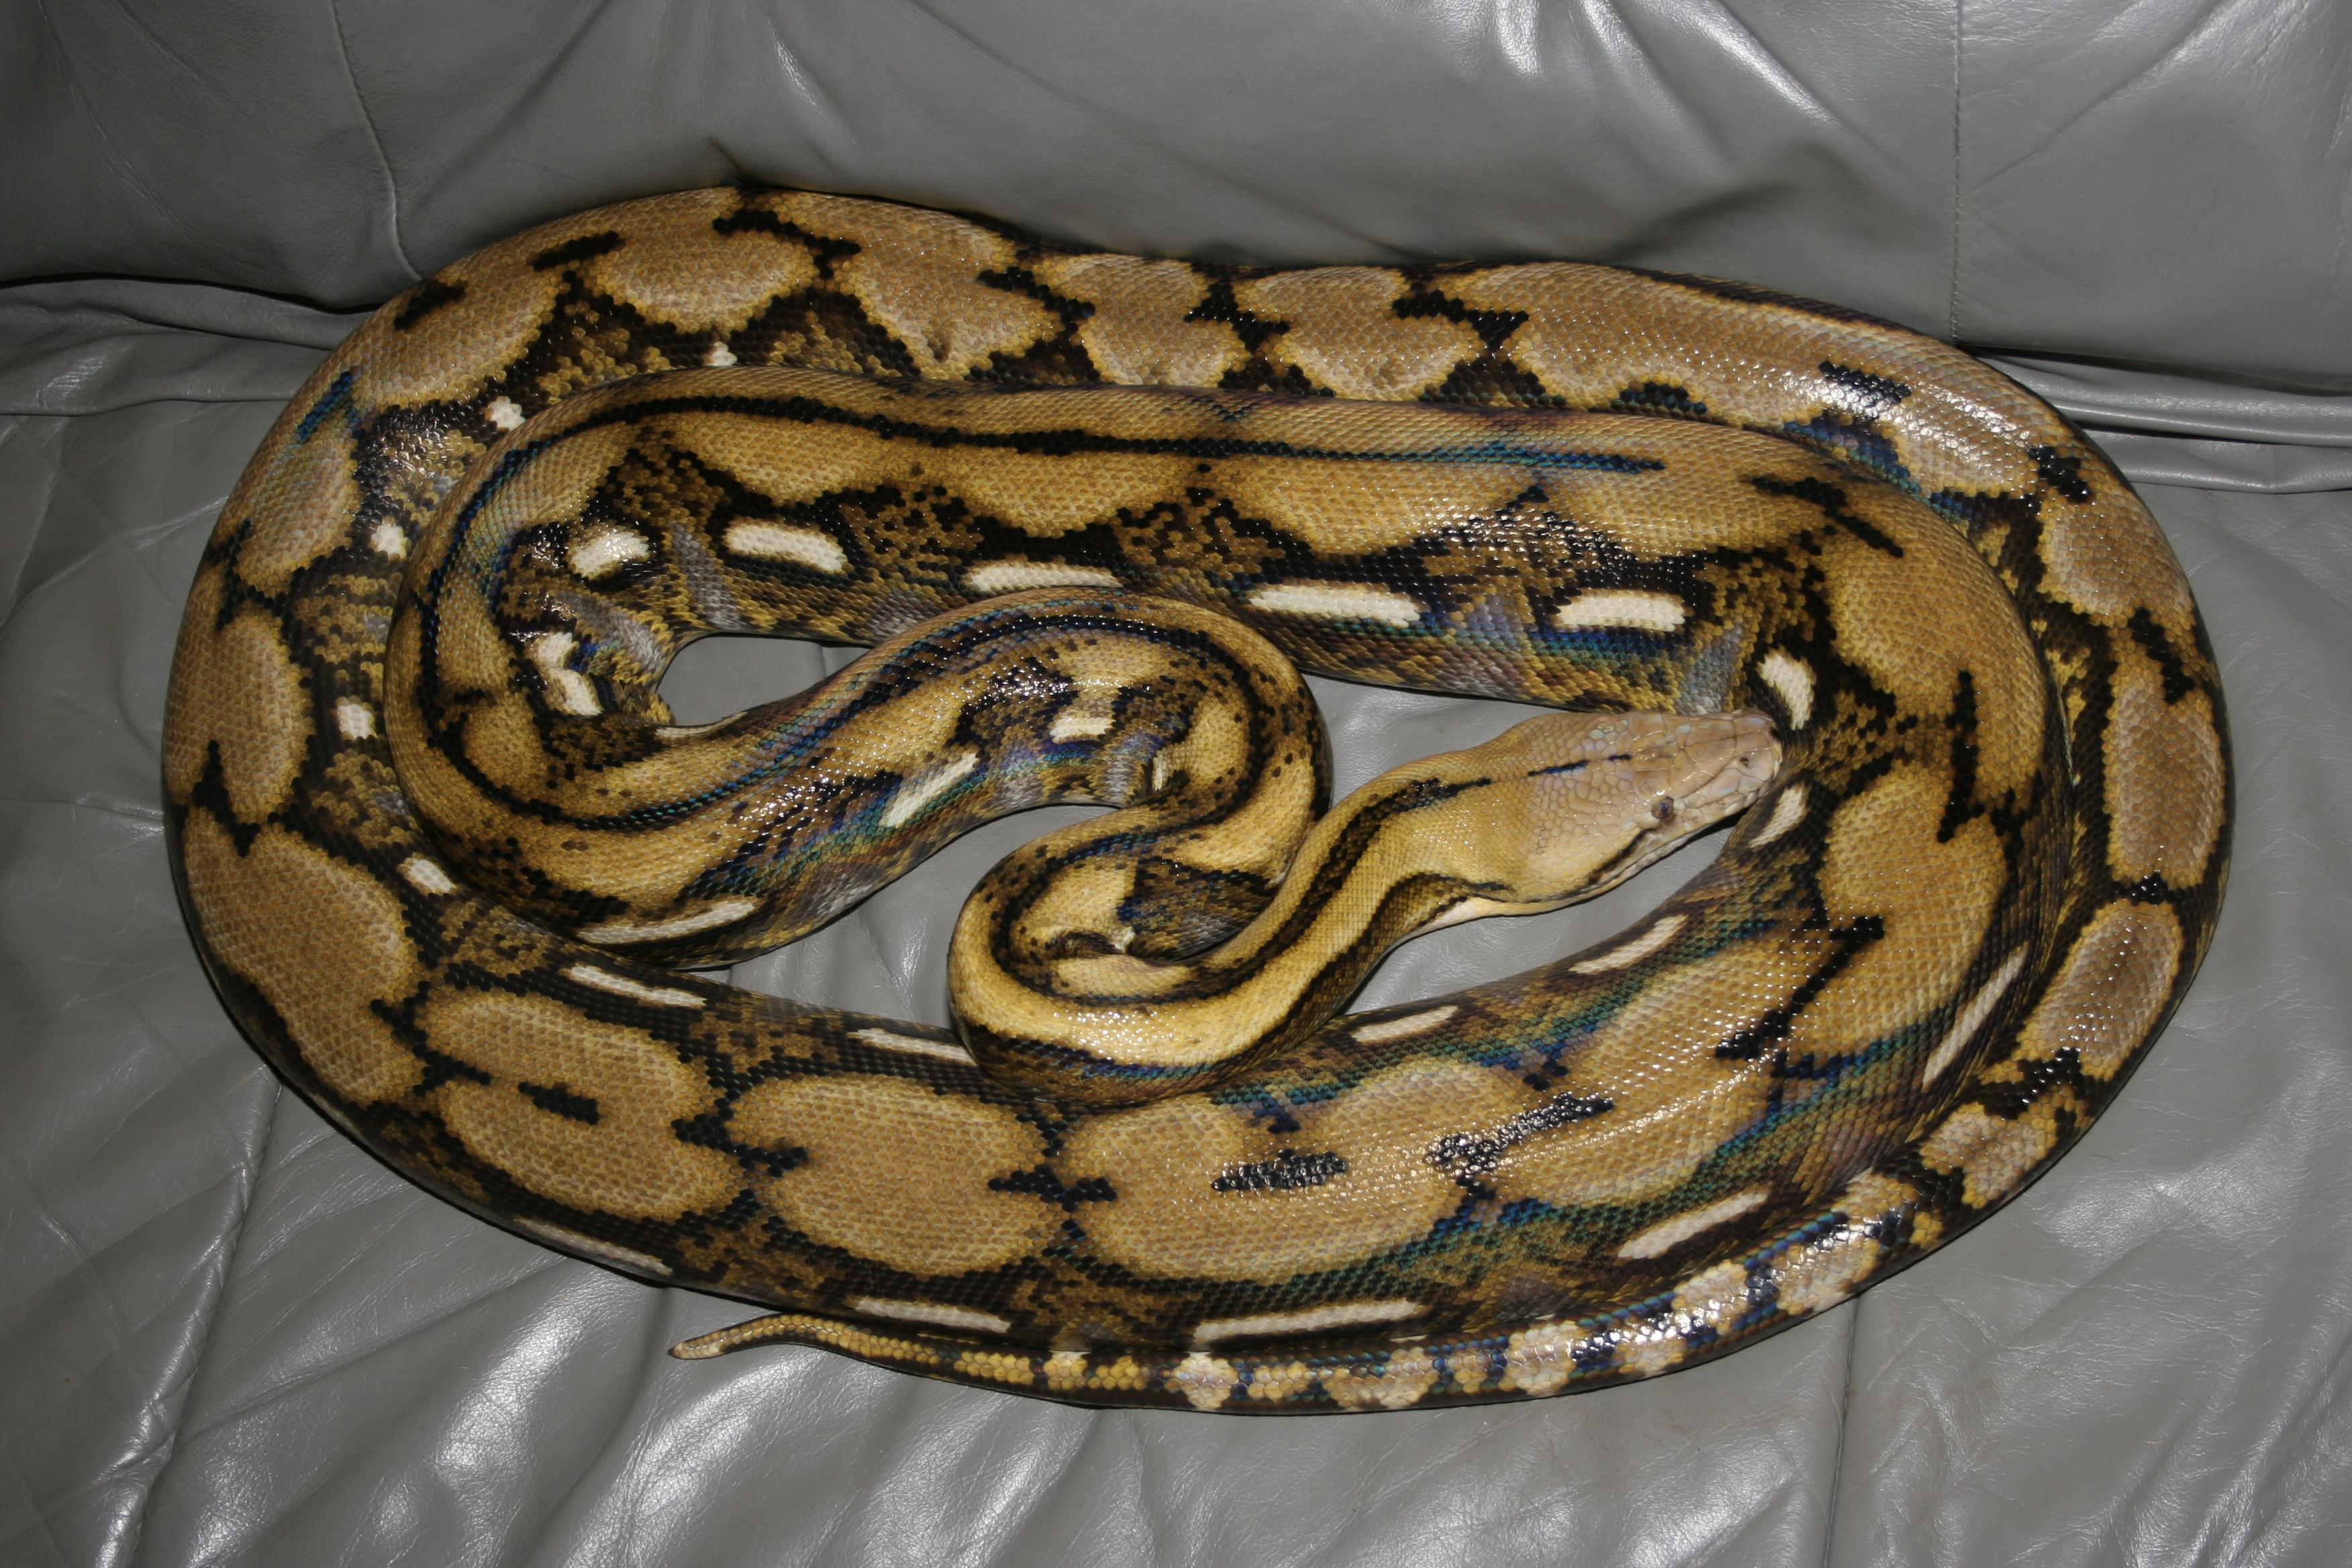 Baby Reticulated Python Baby reticulated python